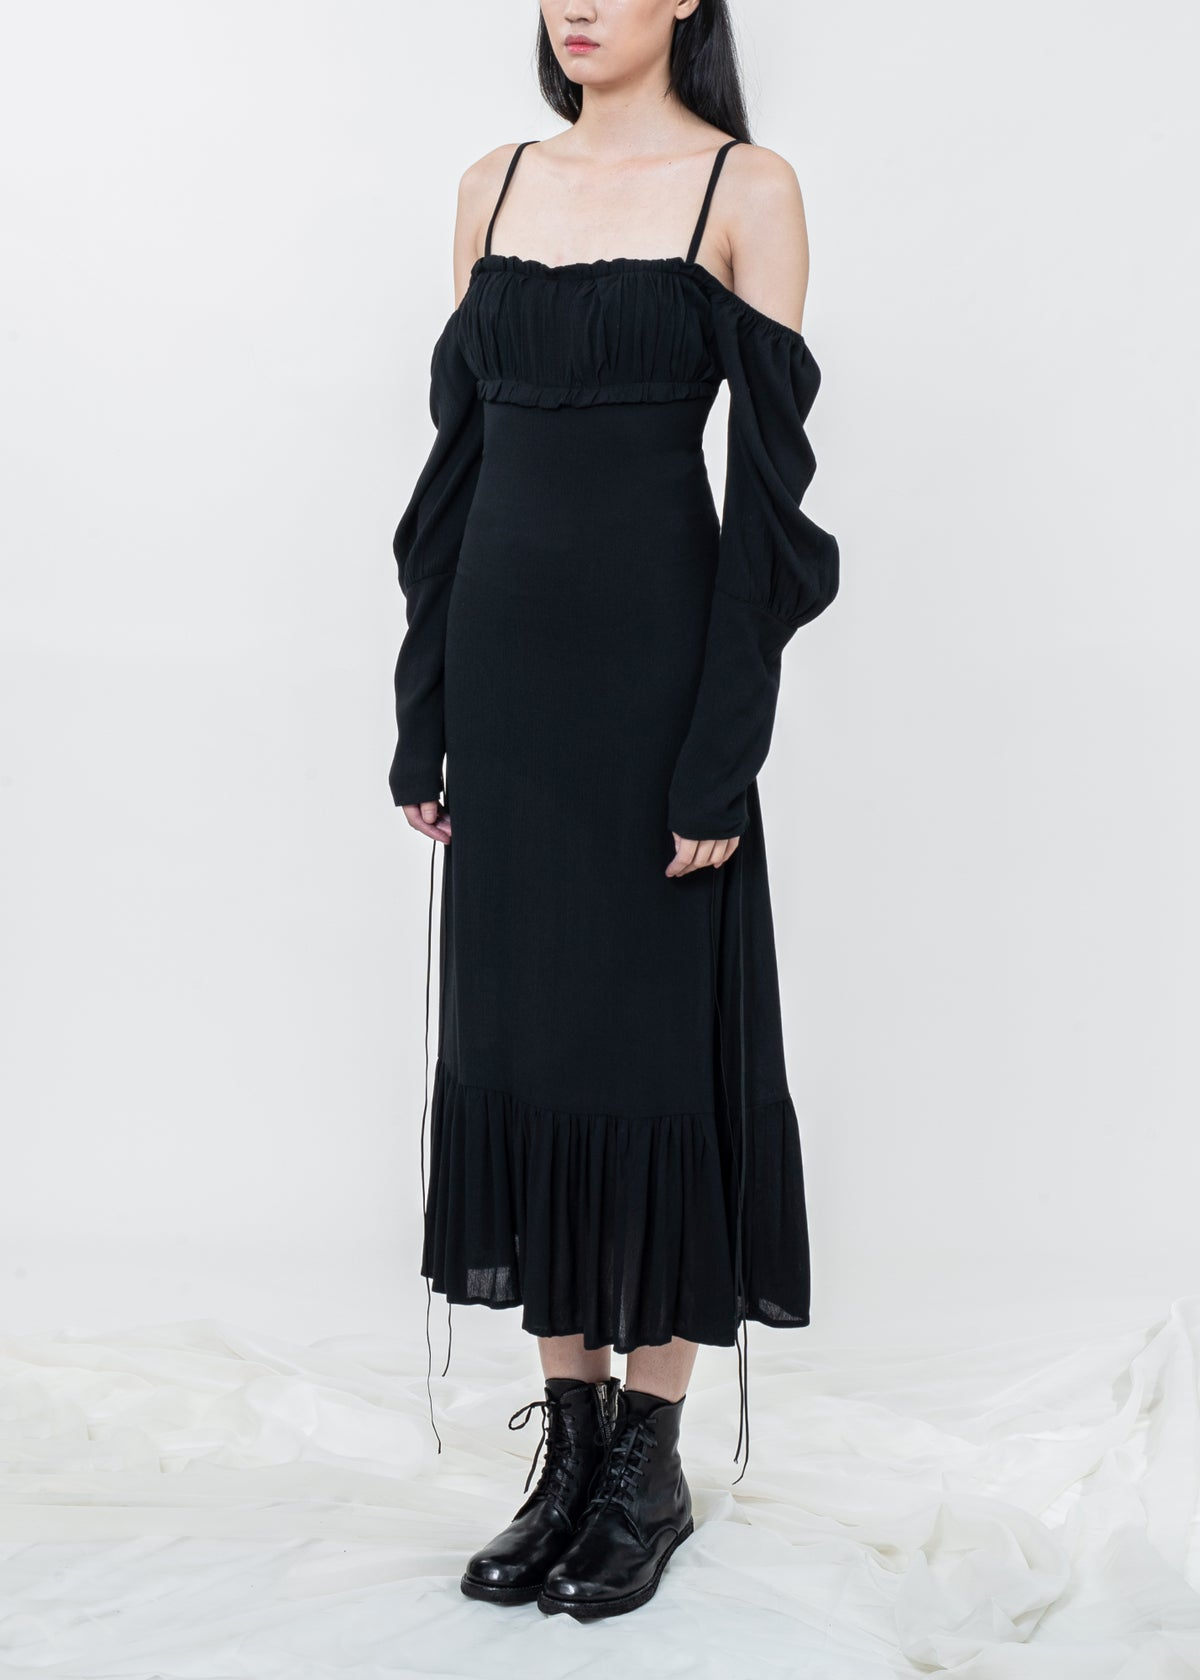 Image of Two Way Mermaid Midi Dress